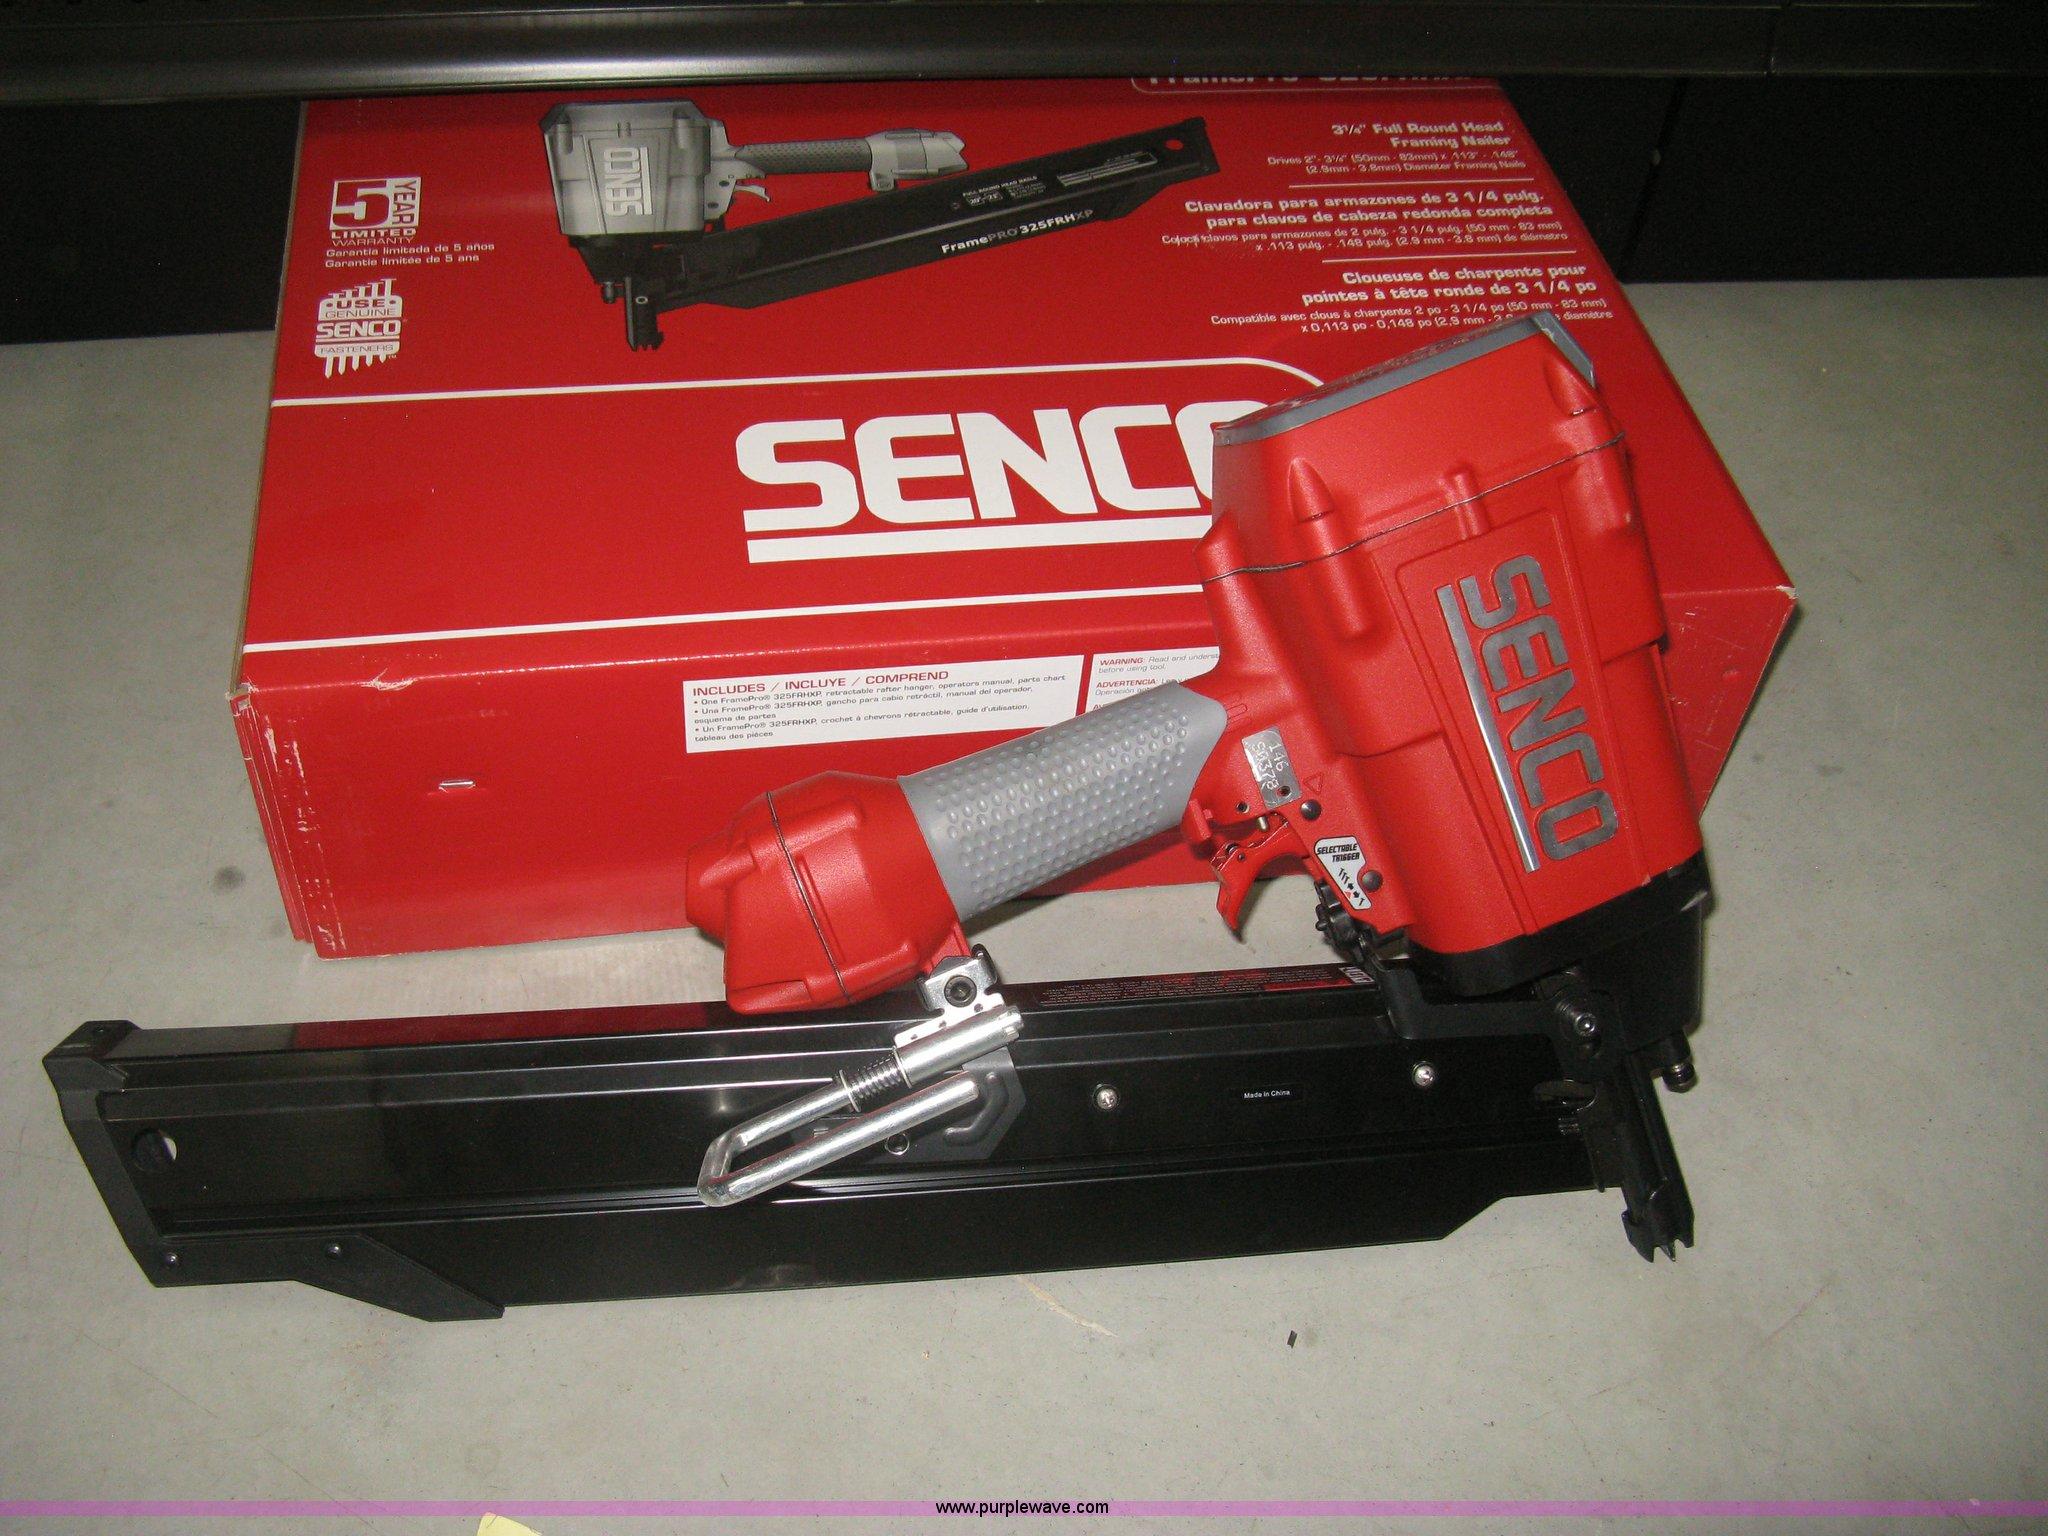 Senco Frame Pro 325 FRHXP nail gun   Item BF9253   SOLD! Dec...